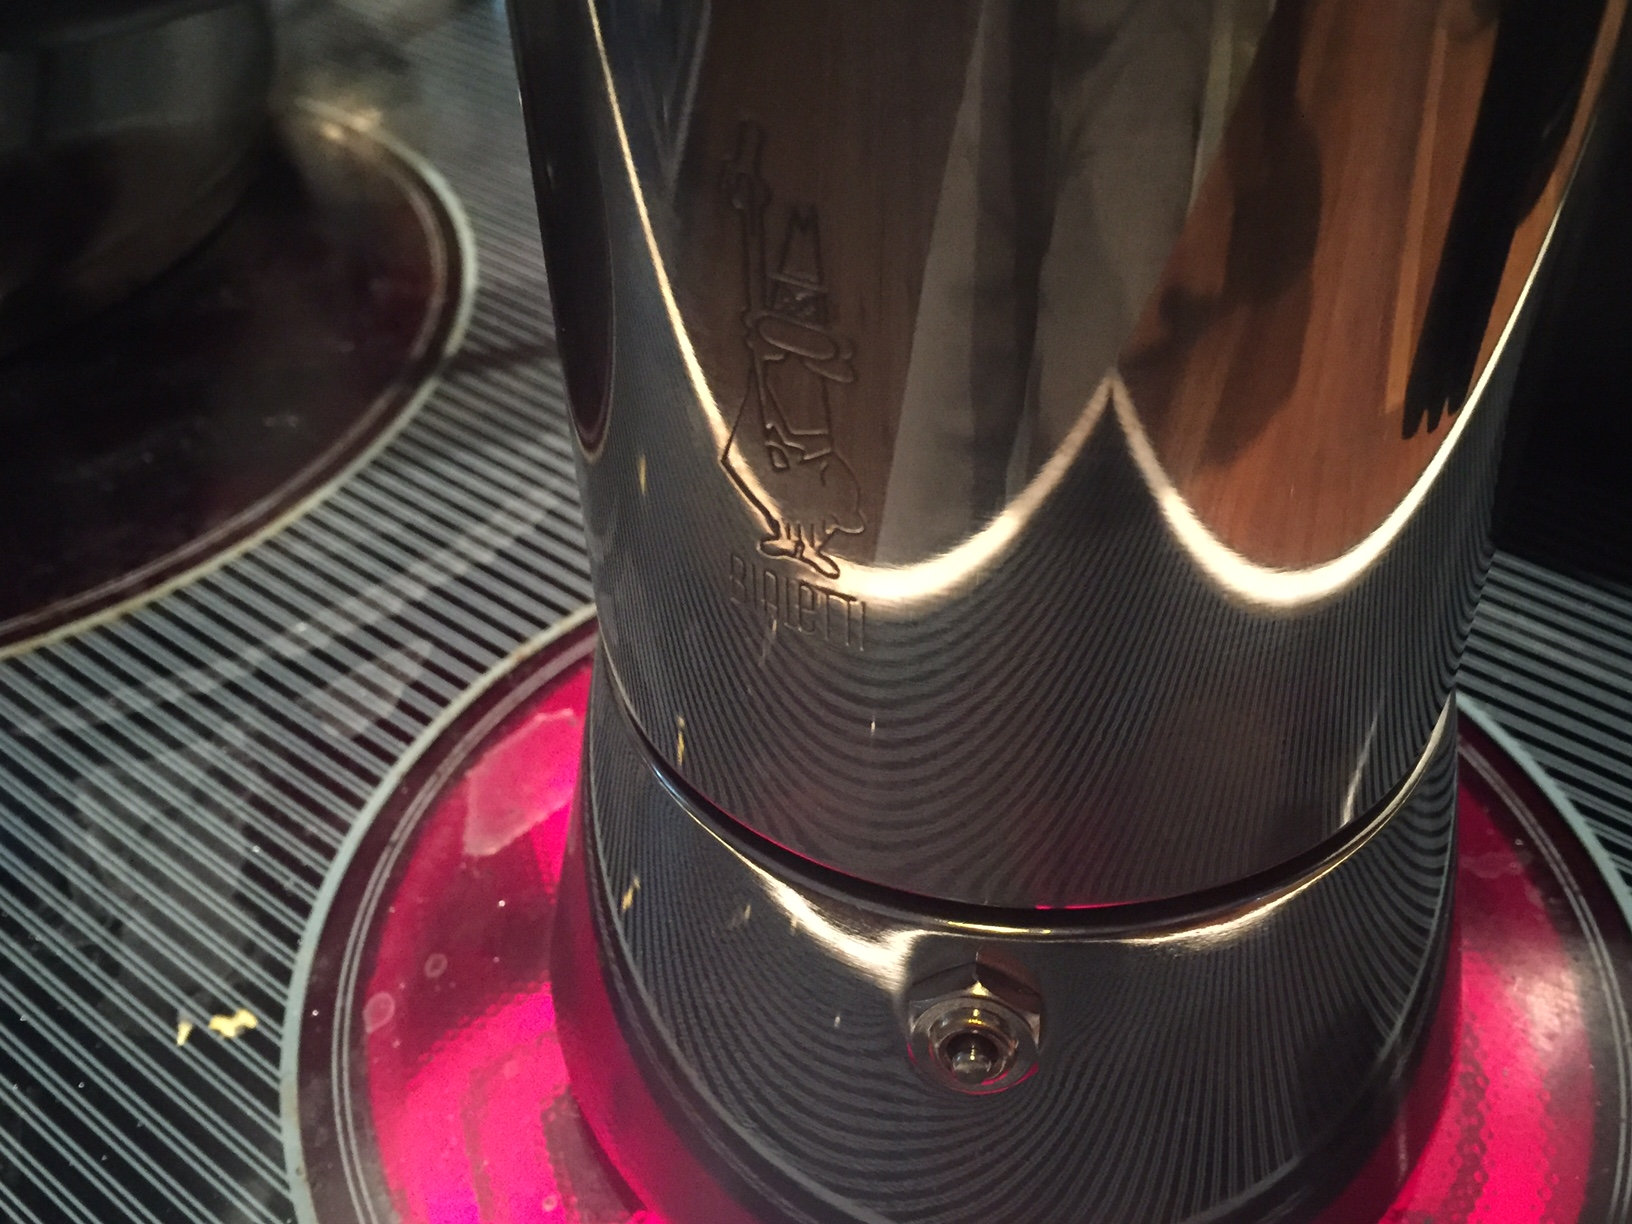 Bialetti Venus auf Kochplatte